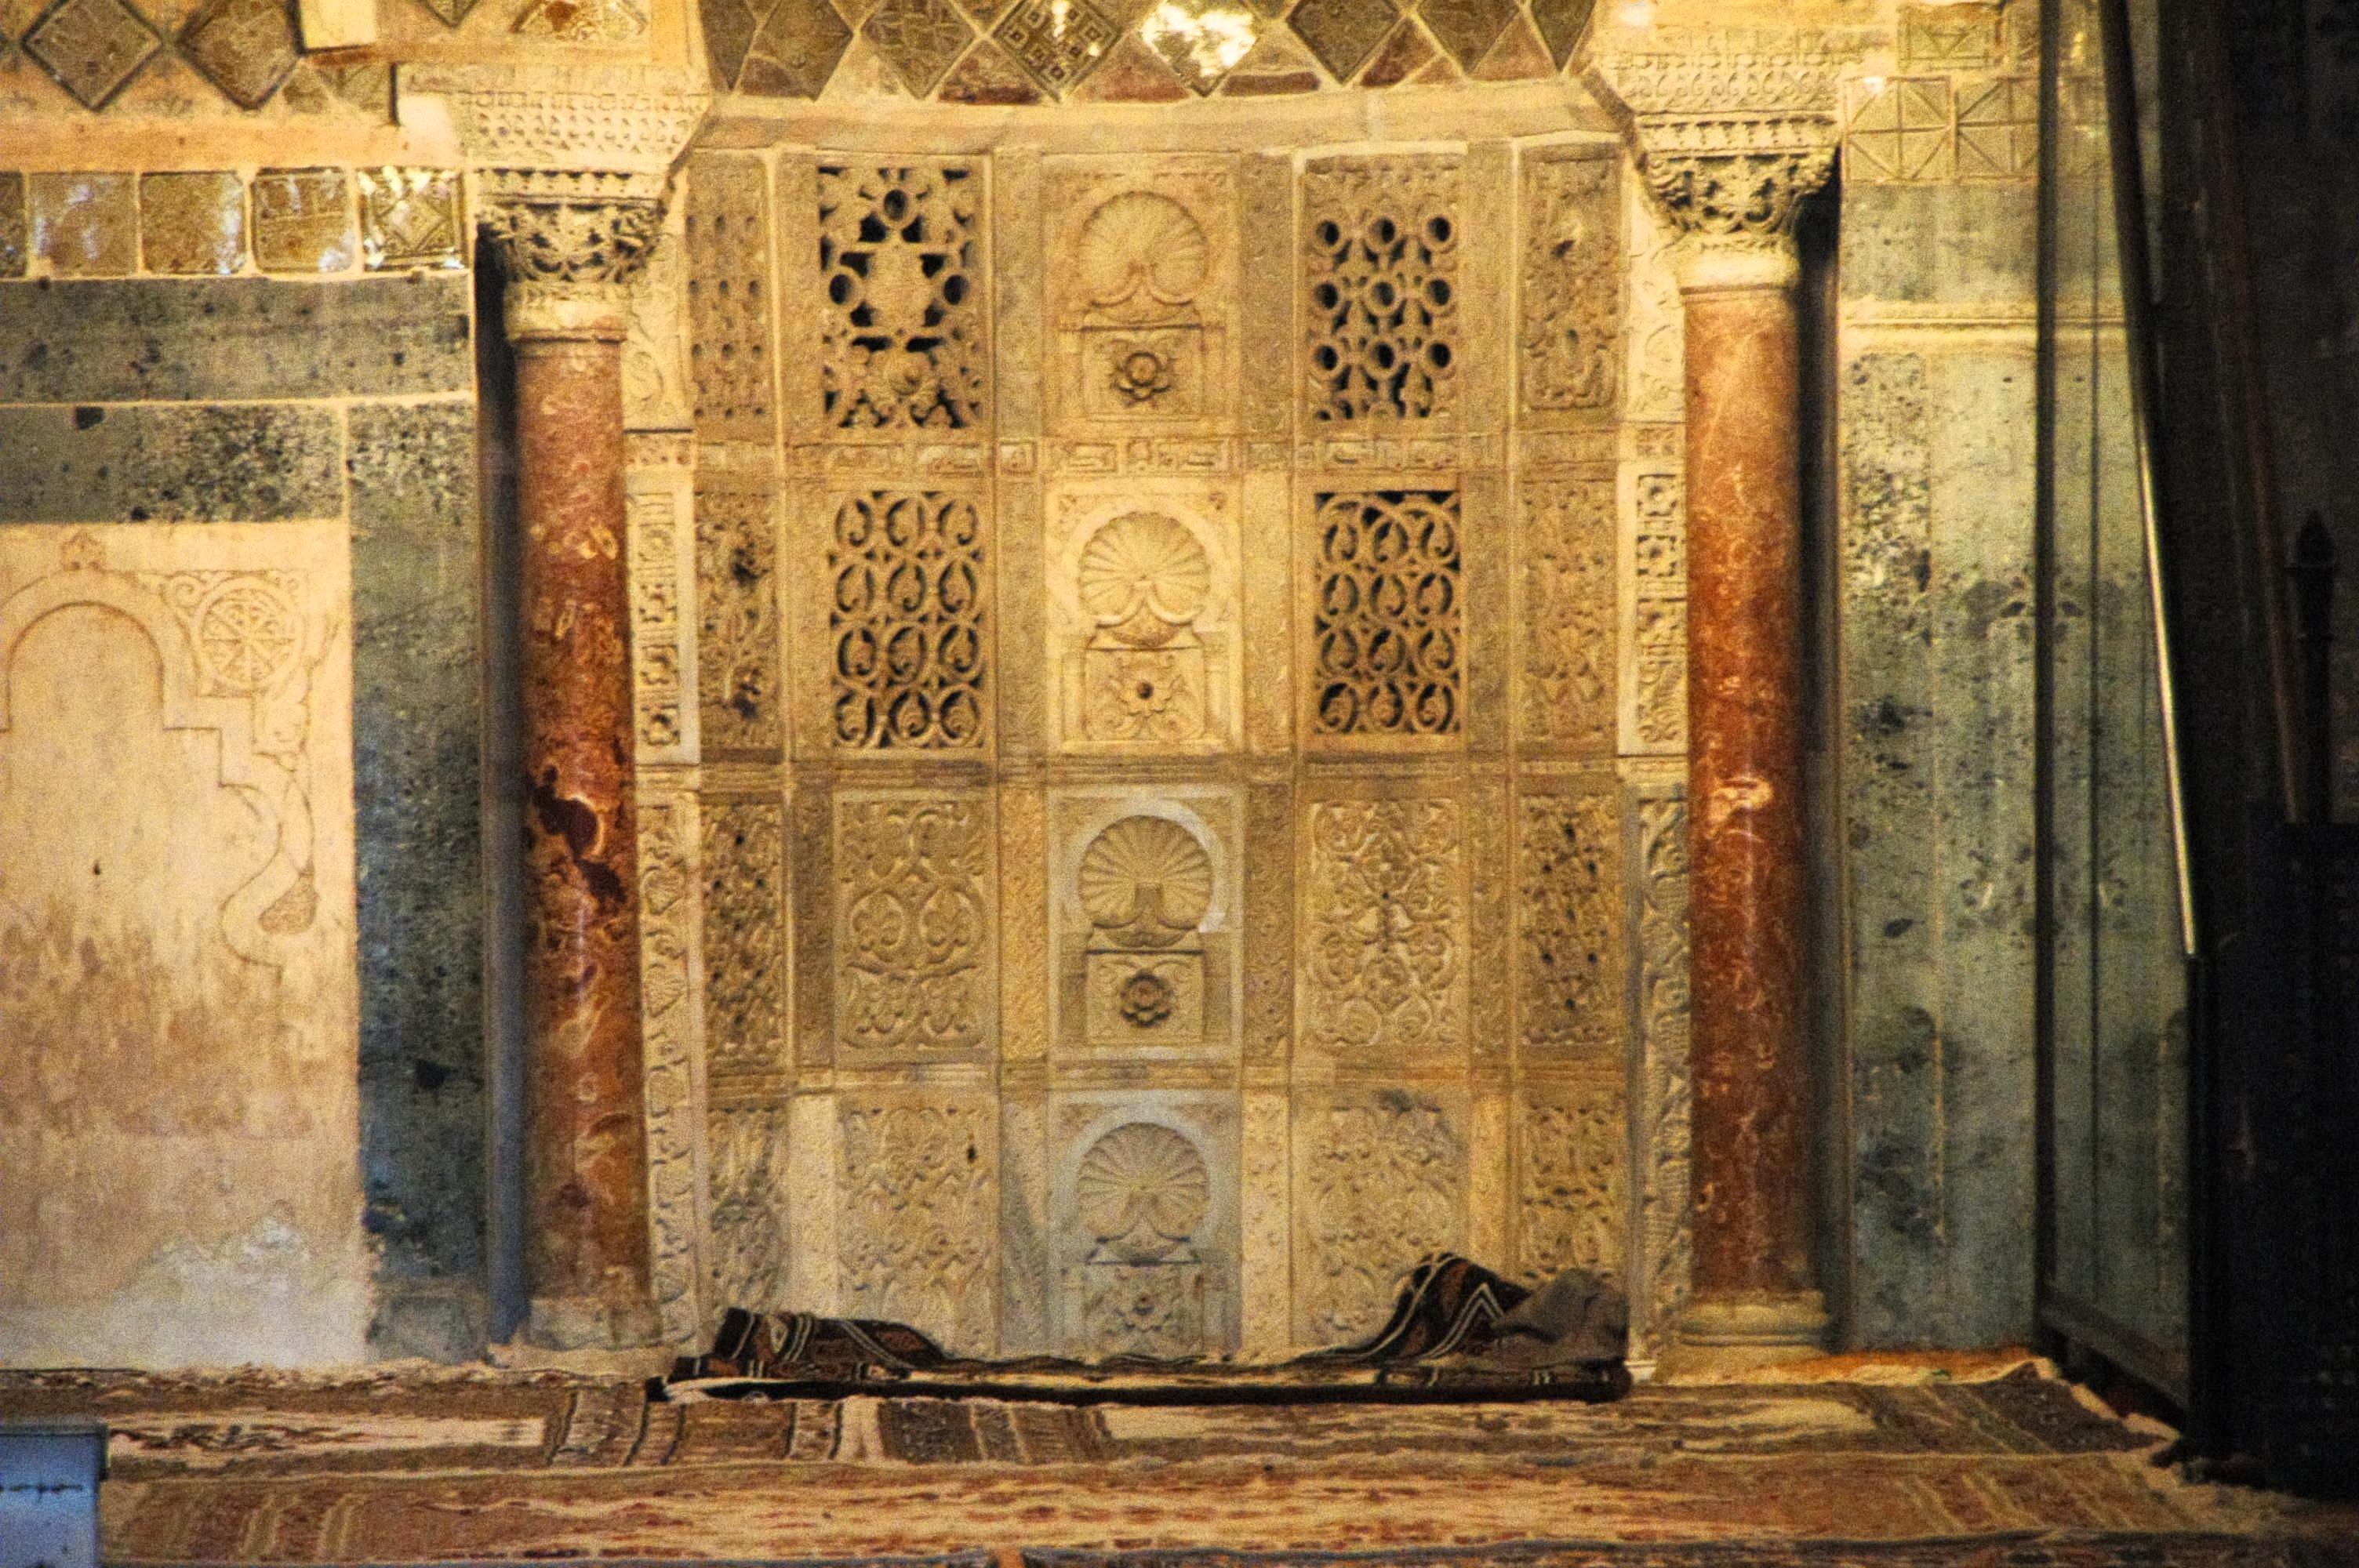 Great Mosque Kairouan Mihrab File:kairouan Great Mosque